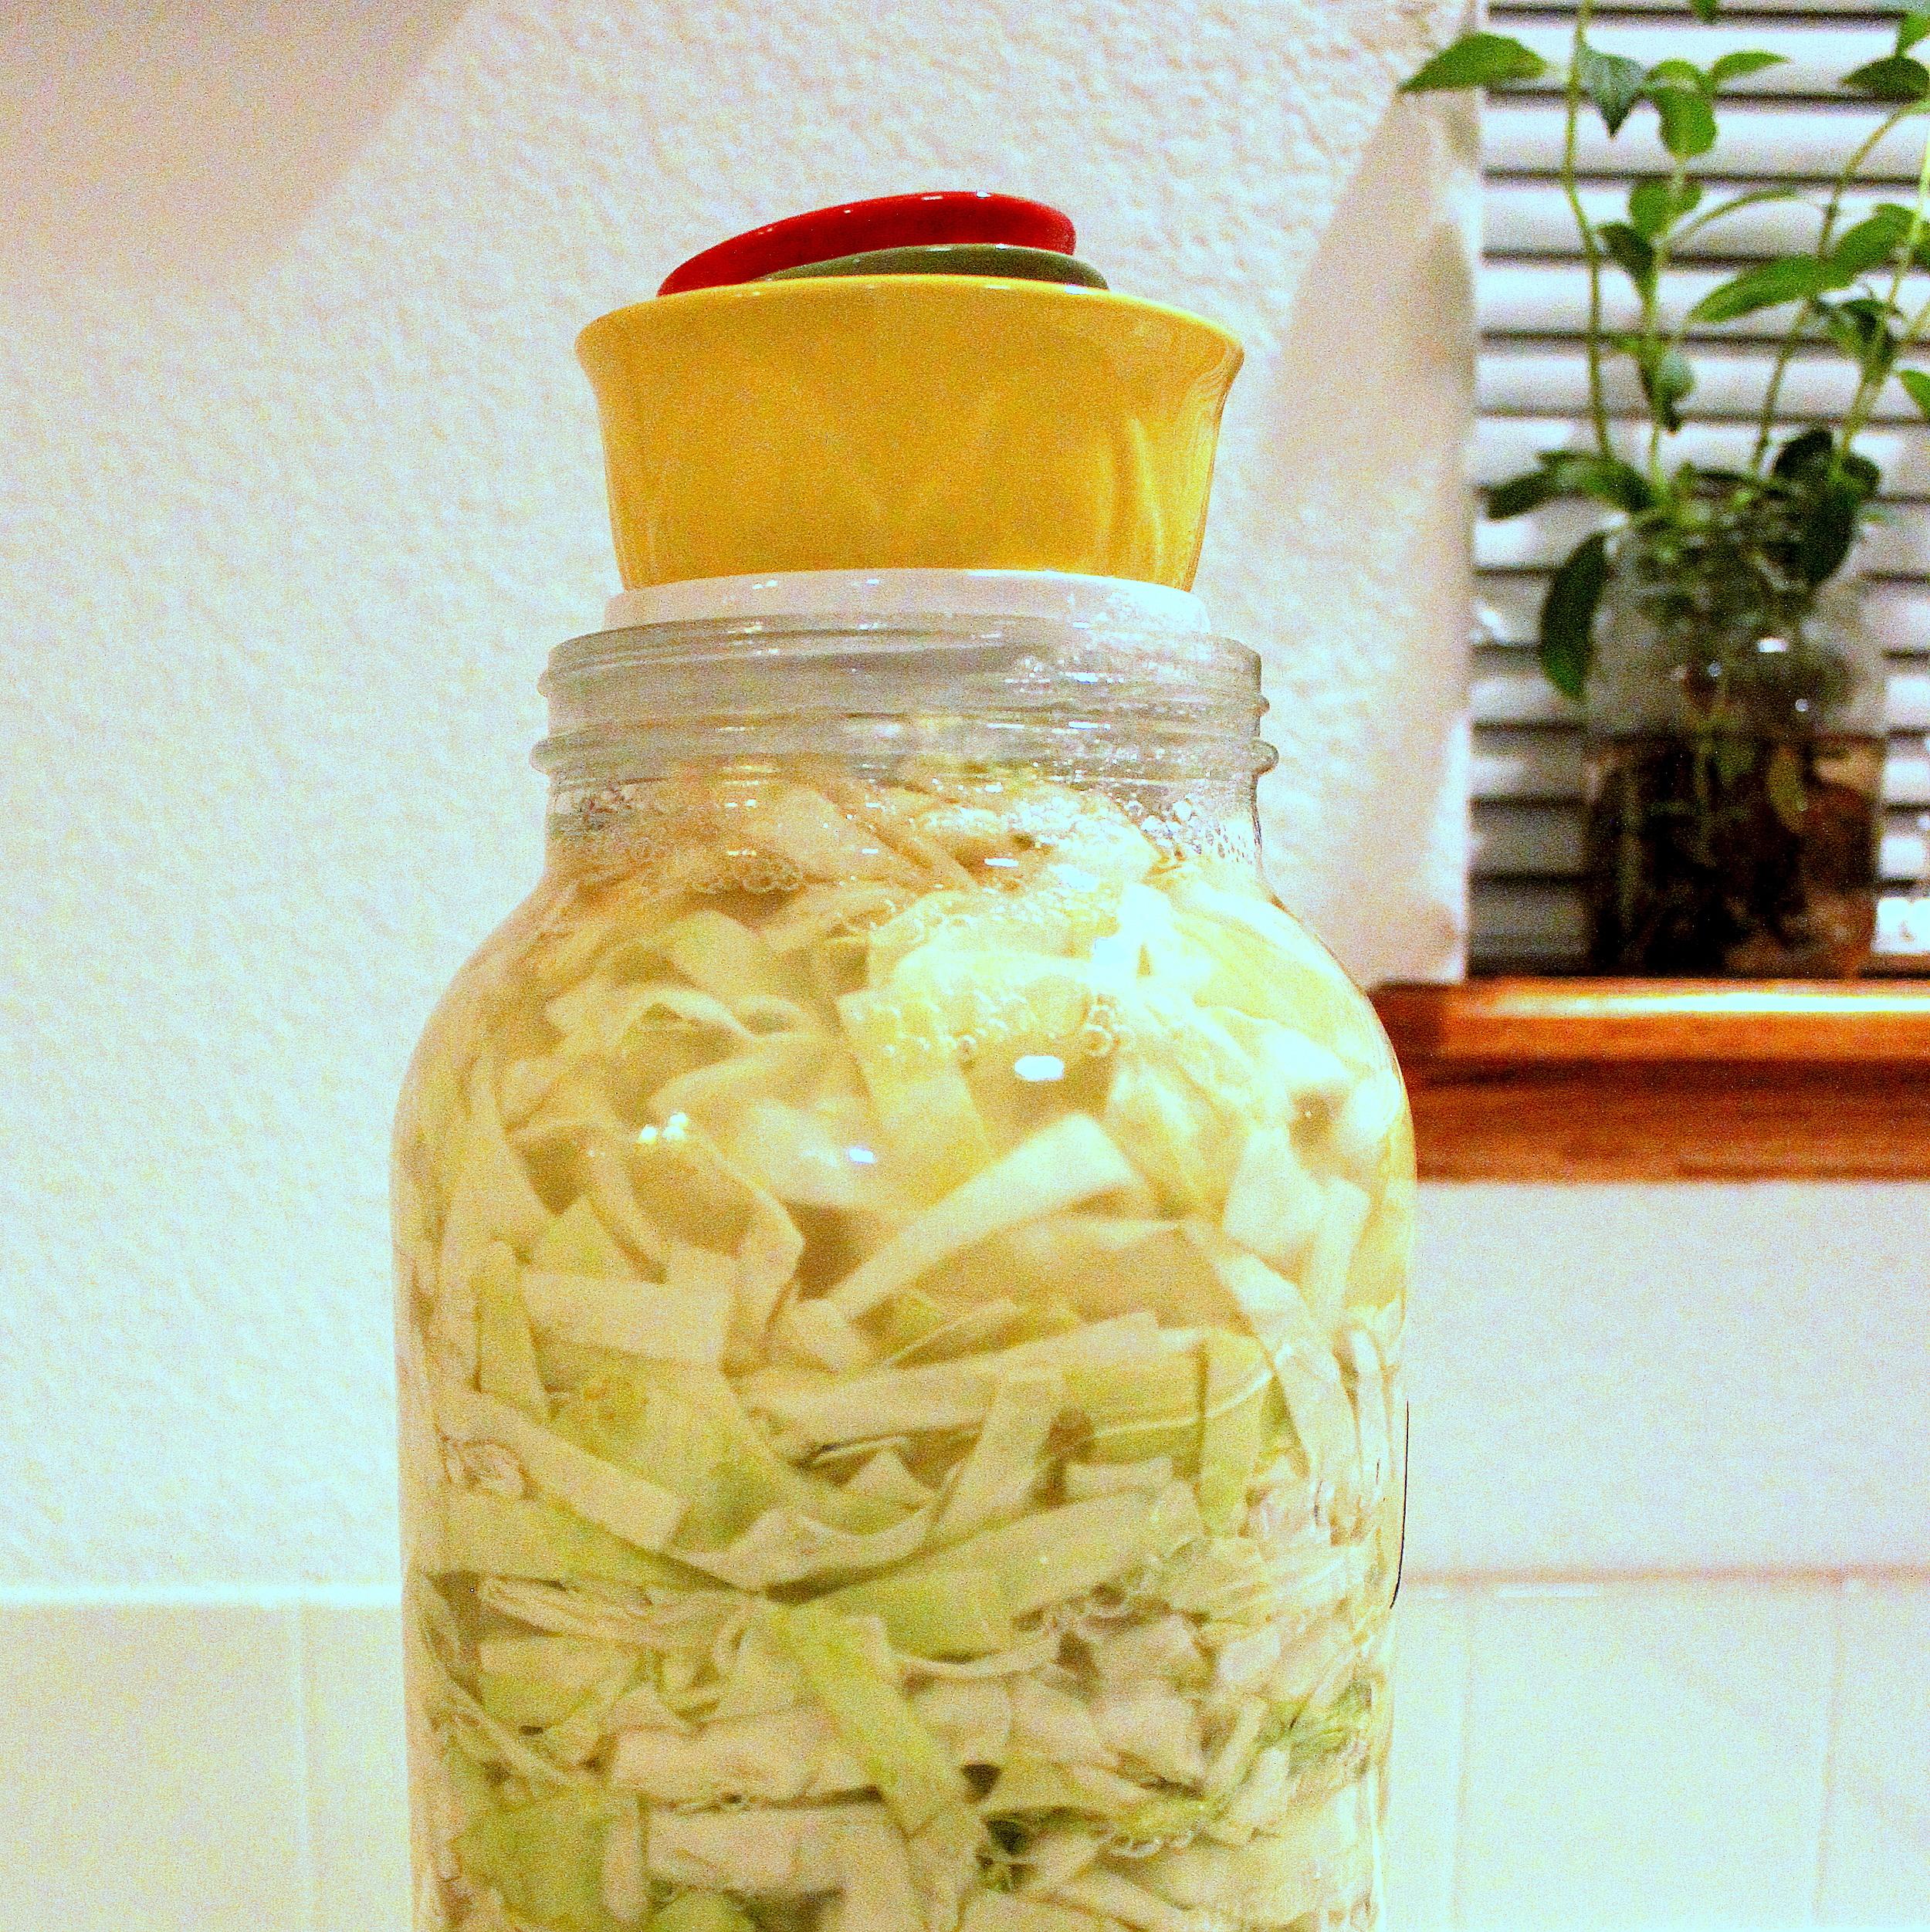 Homemade Sauerkraut from Peas and Hoppiness - www.peasandhoppiness.com